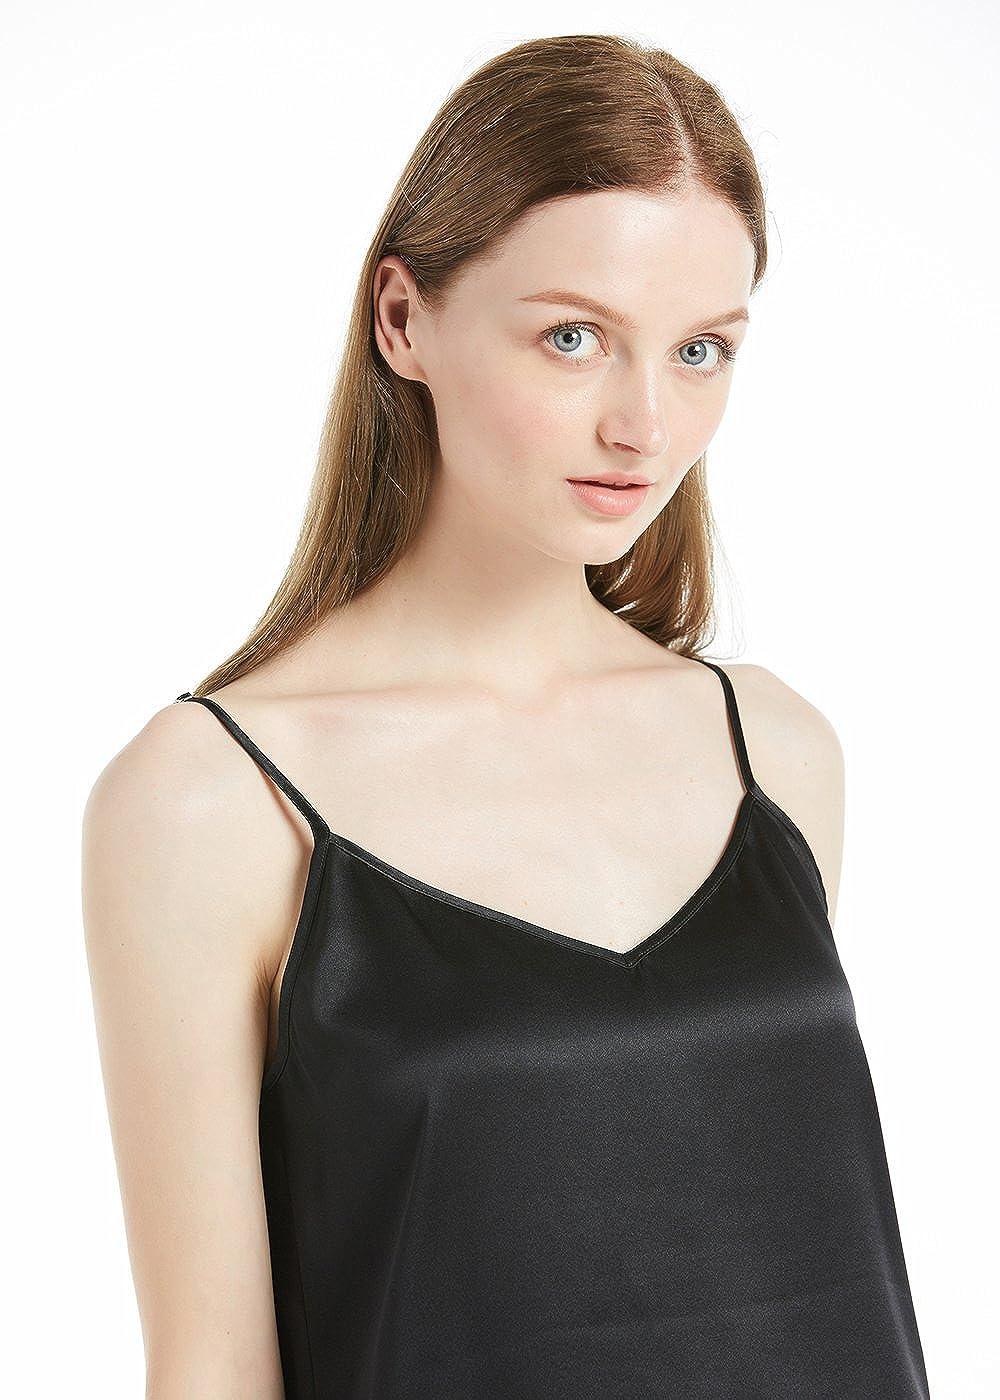 70cf7469b9 LILYSILK Women s Silk Camisole Vest Lingerie Ladies Tank Top 22 Momme  Charmeuse Silk  Amazon.co.uk  Clothing